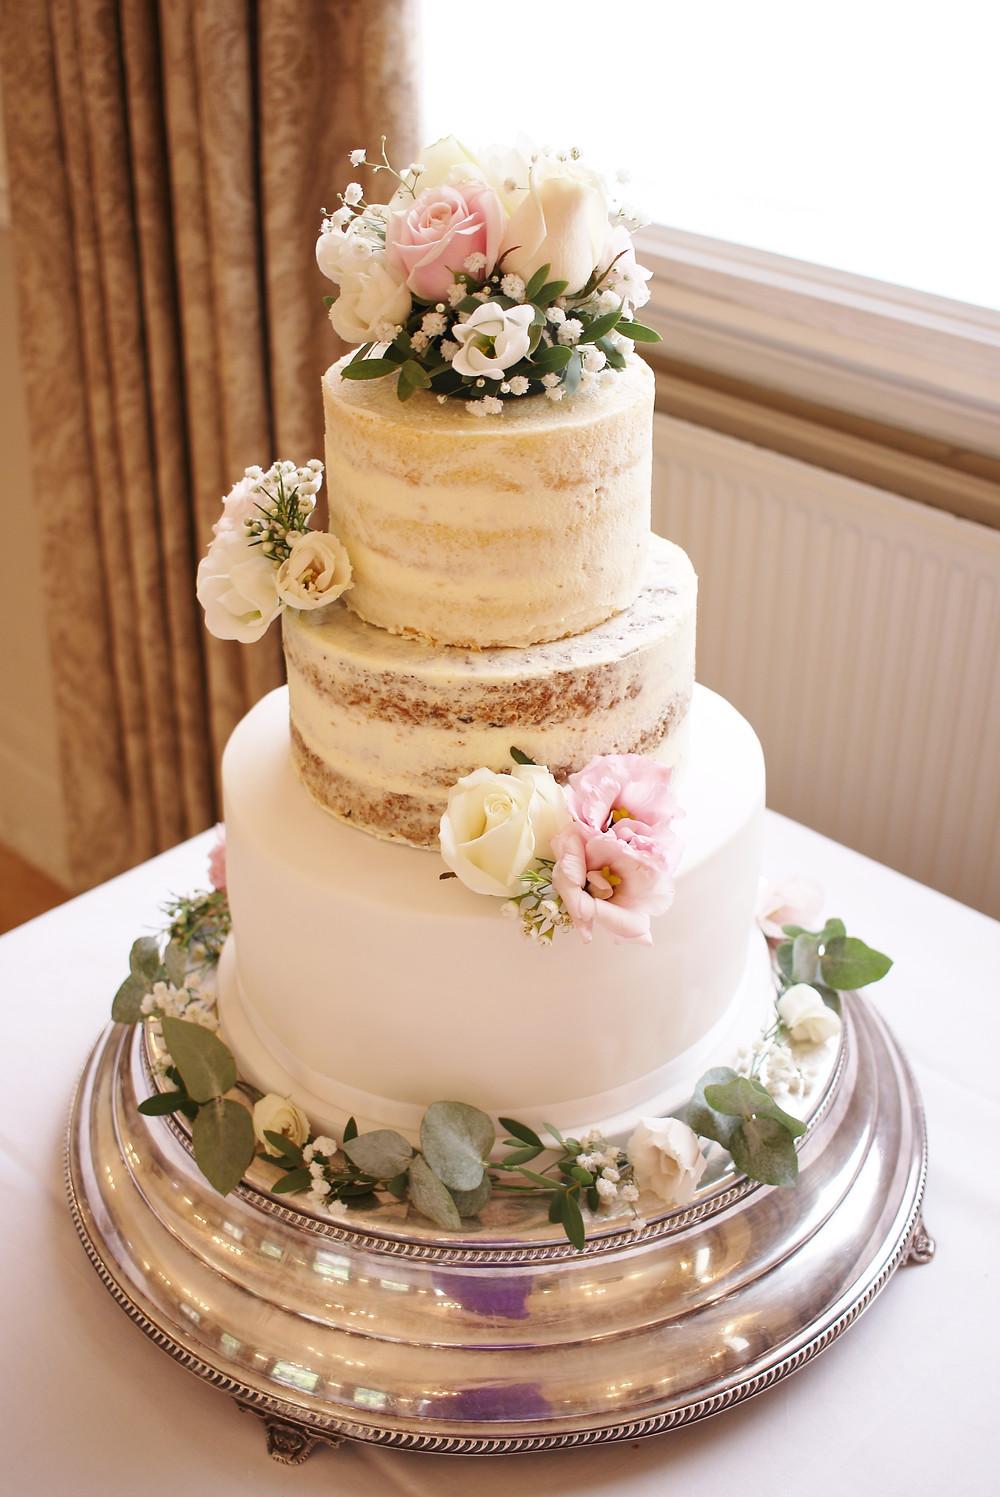 Semi-naked wedding cake at Clifton Pavilion, Bristol